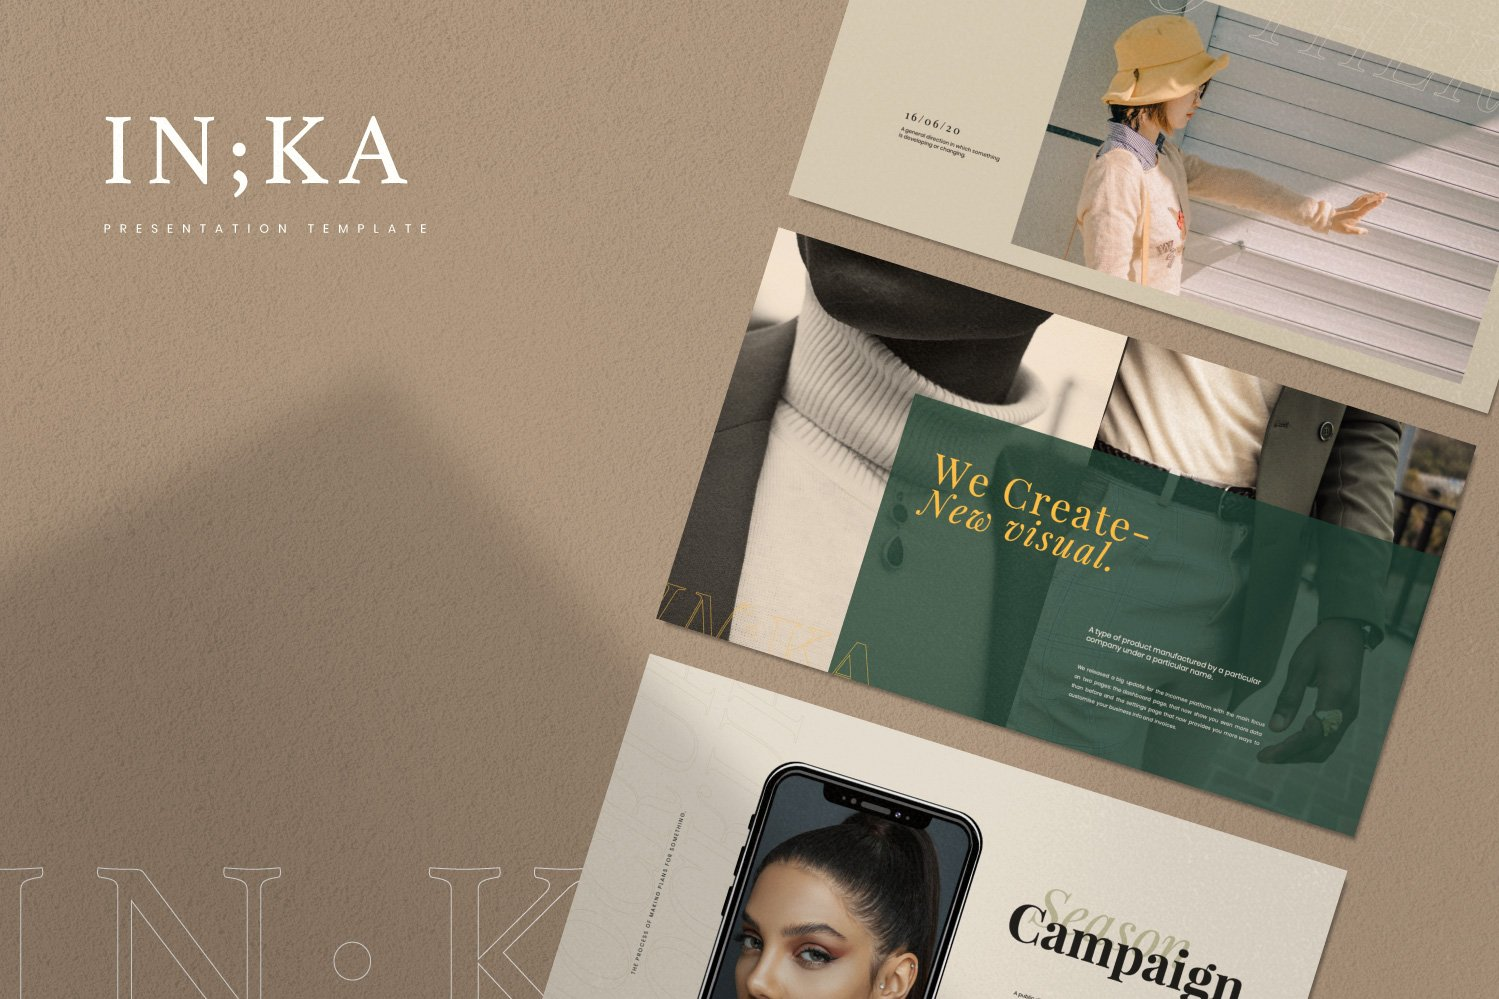 时尚创意服装摄影作品集幻灯片设计模板 Iconic – Fashion Lookbook PowerPoint插图(2)